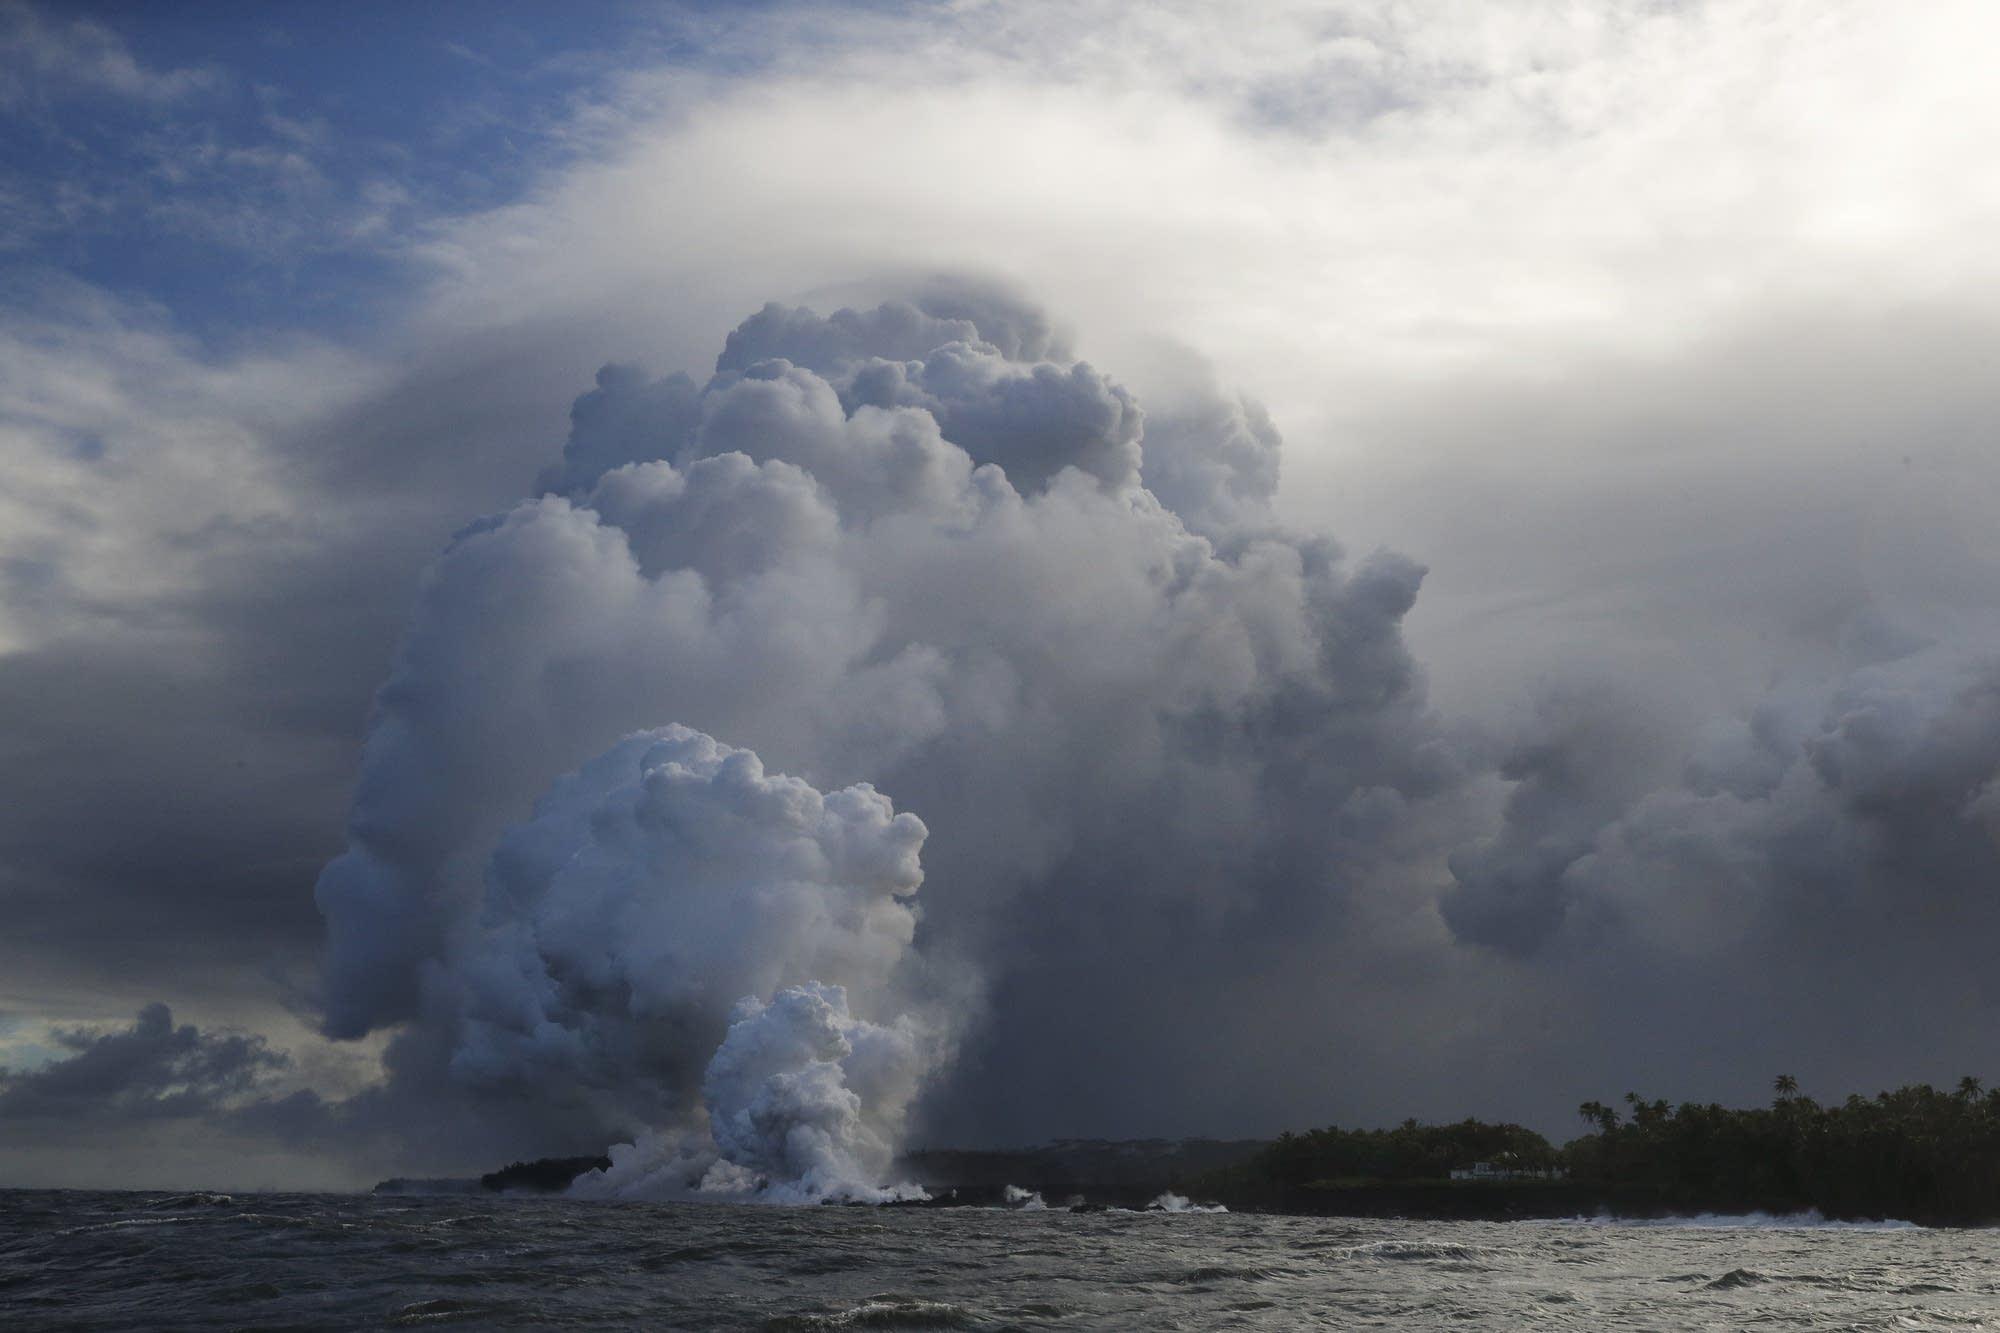 A plume of steam rises as lava enters the ocean near Pahoa, Hawaii.